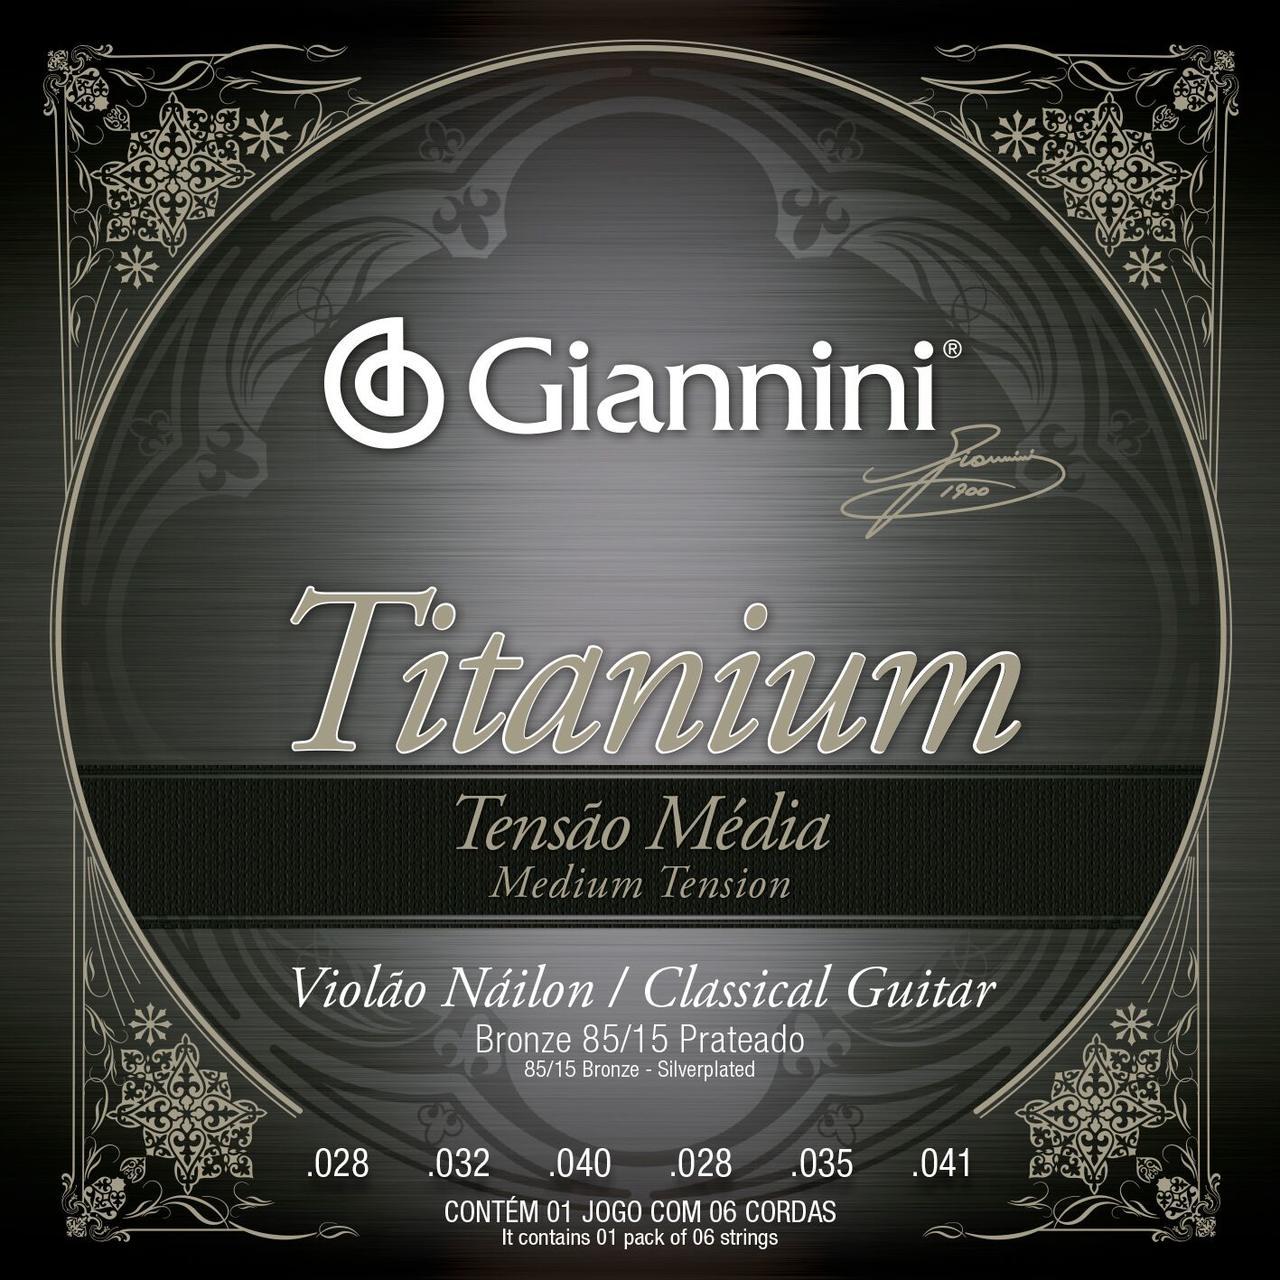 Encordoamento p/Violão Nylon Giannini Série Titaniun Color 85/15 - GENWTM